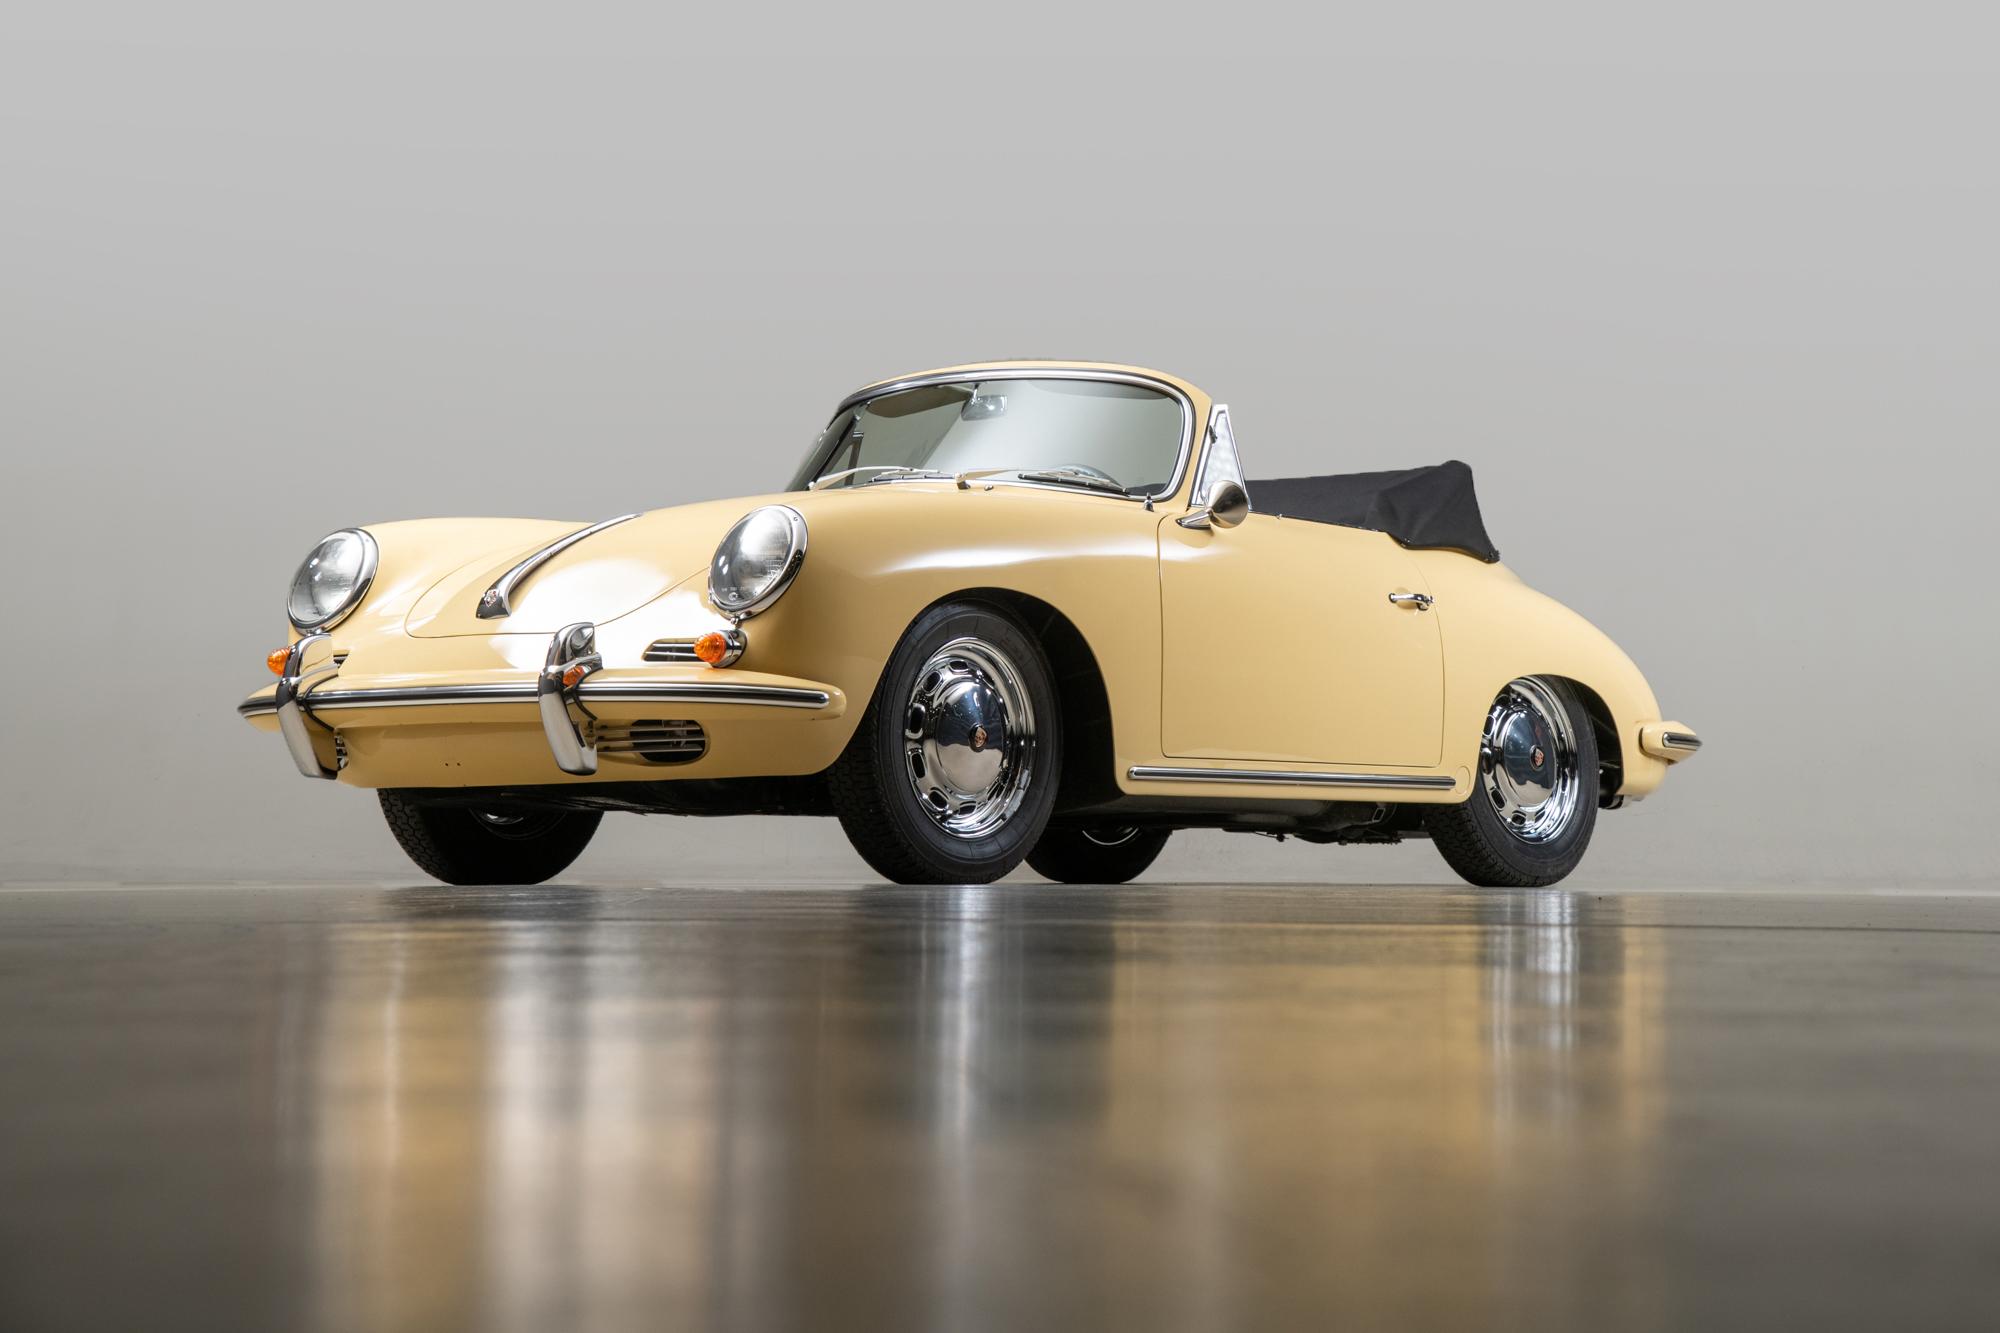 1965 Porsche 356SC Cabriolet , CHAMPAGNE YELLOW, VIN 161040, MILEAGE 28209